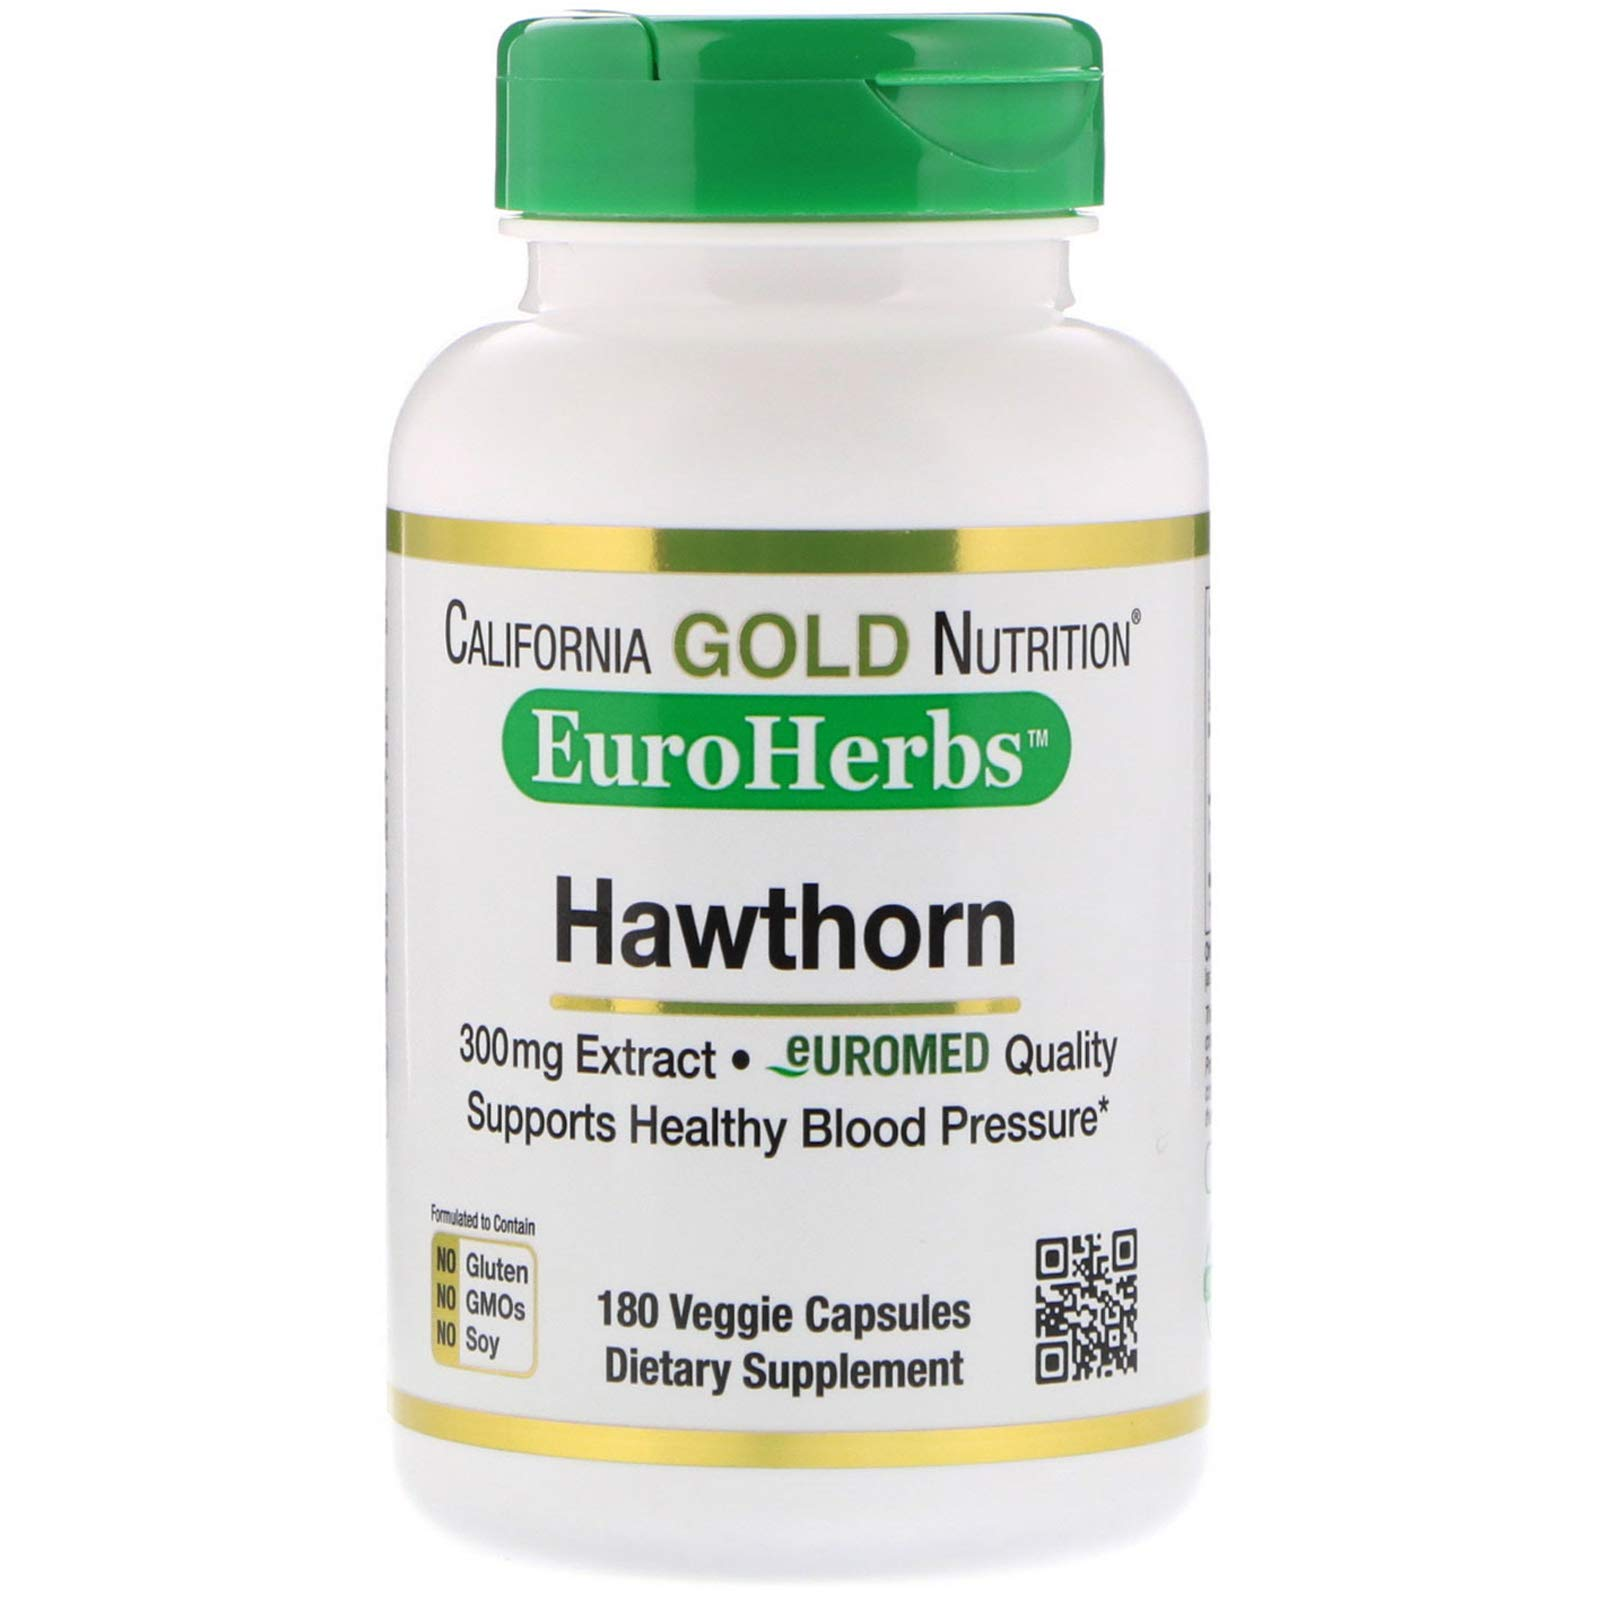 California Gold Nutrition, Hawthorn Extract, EuroHerbs, European Quality, 300 mg, 180 Veggie Capsules